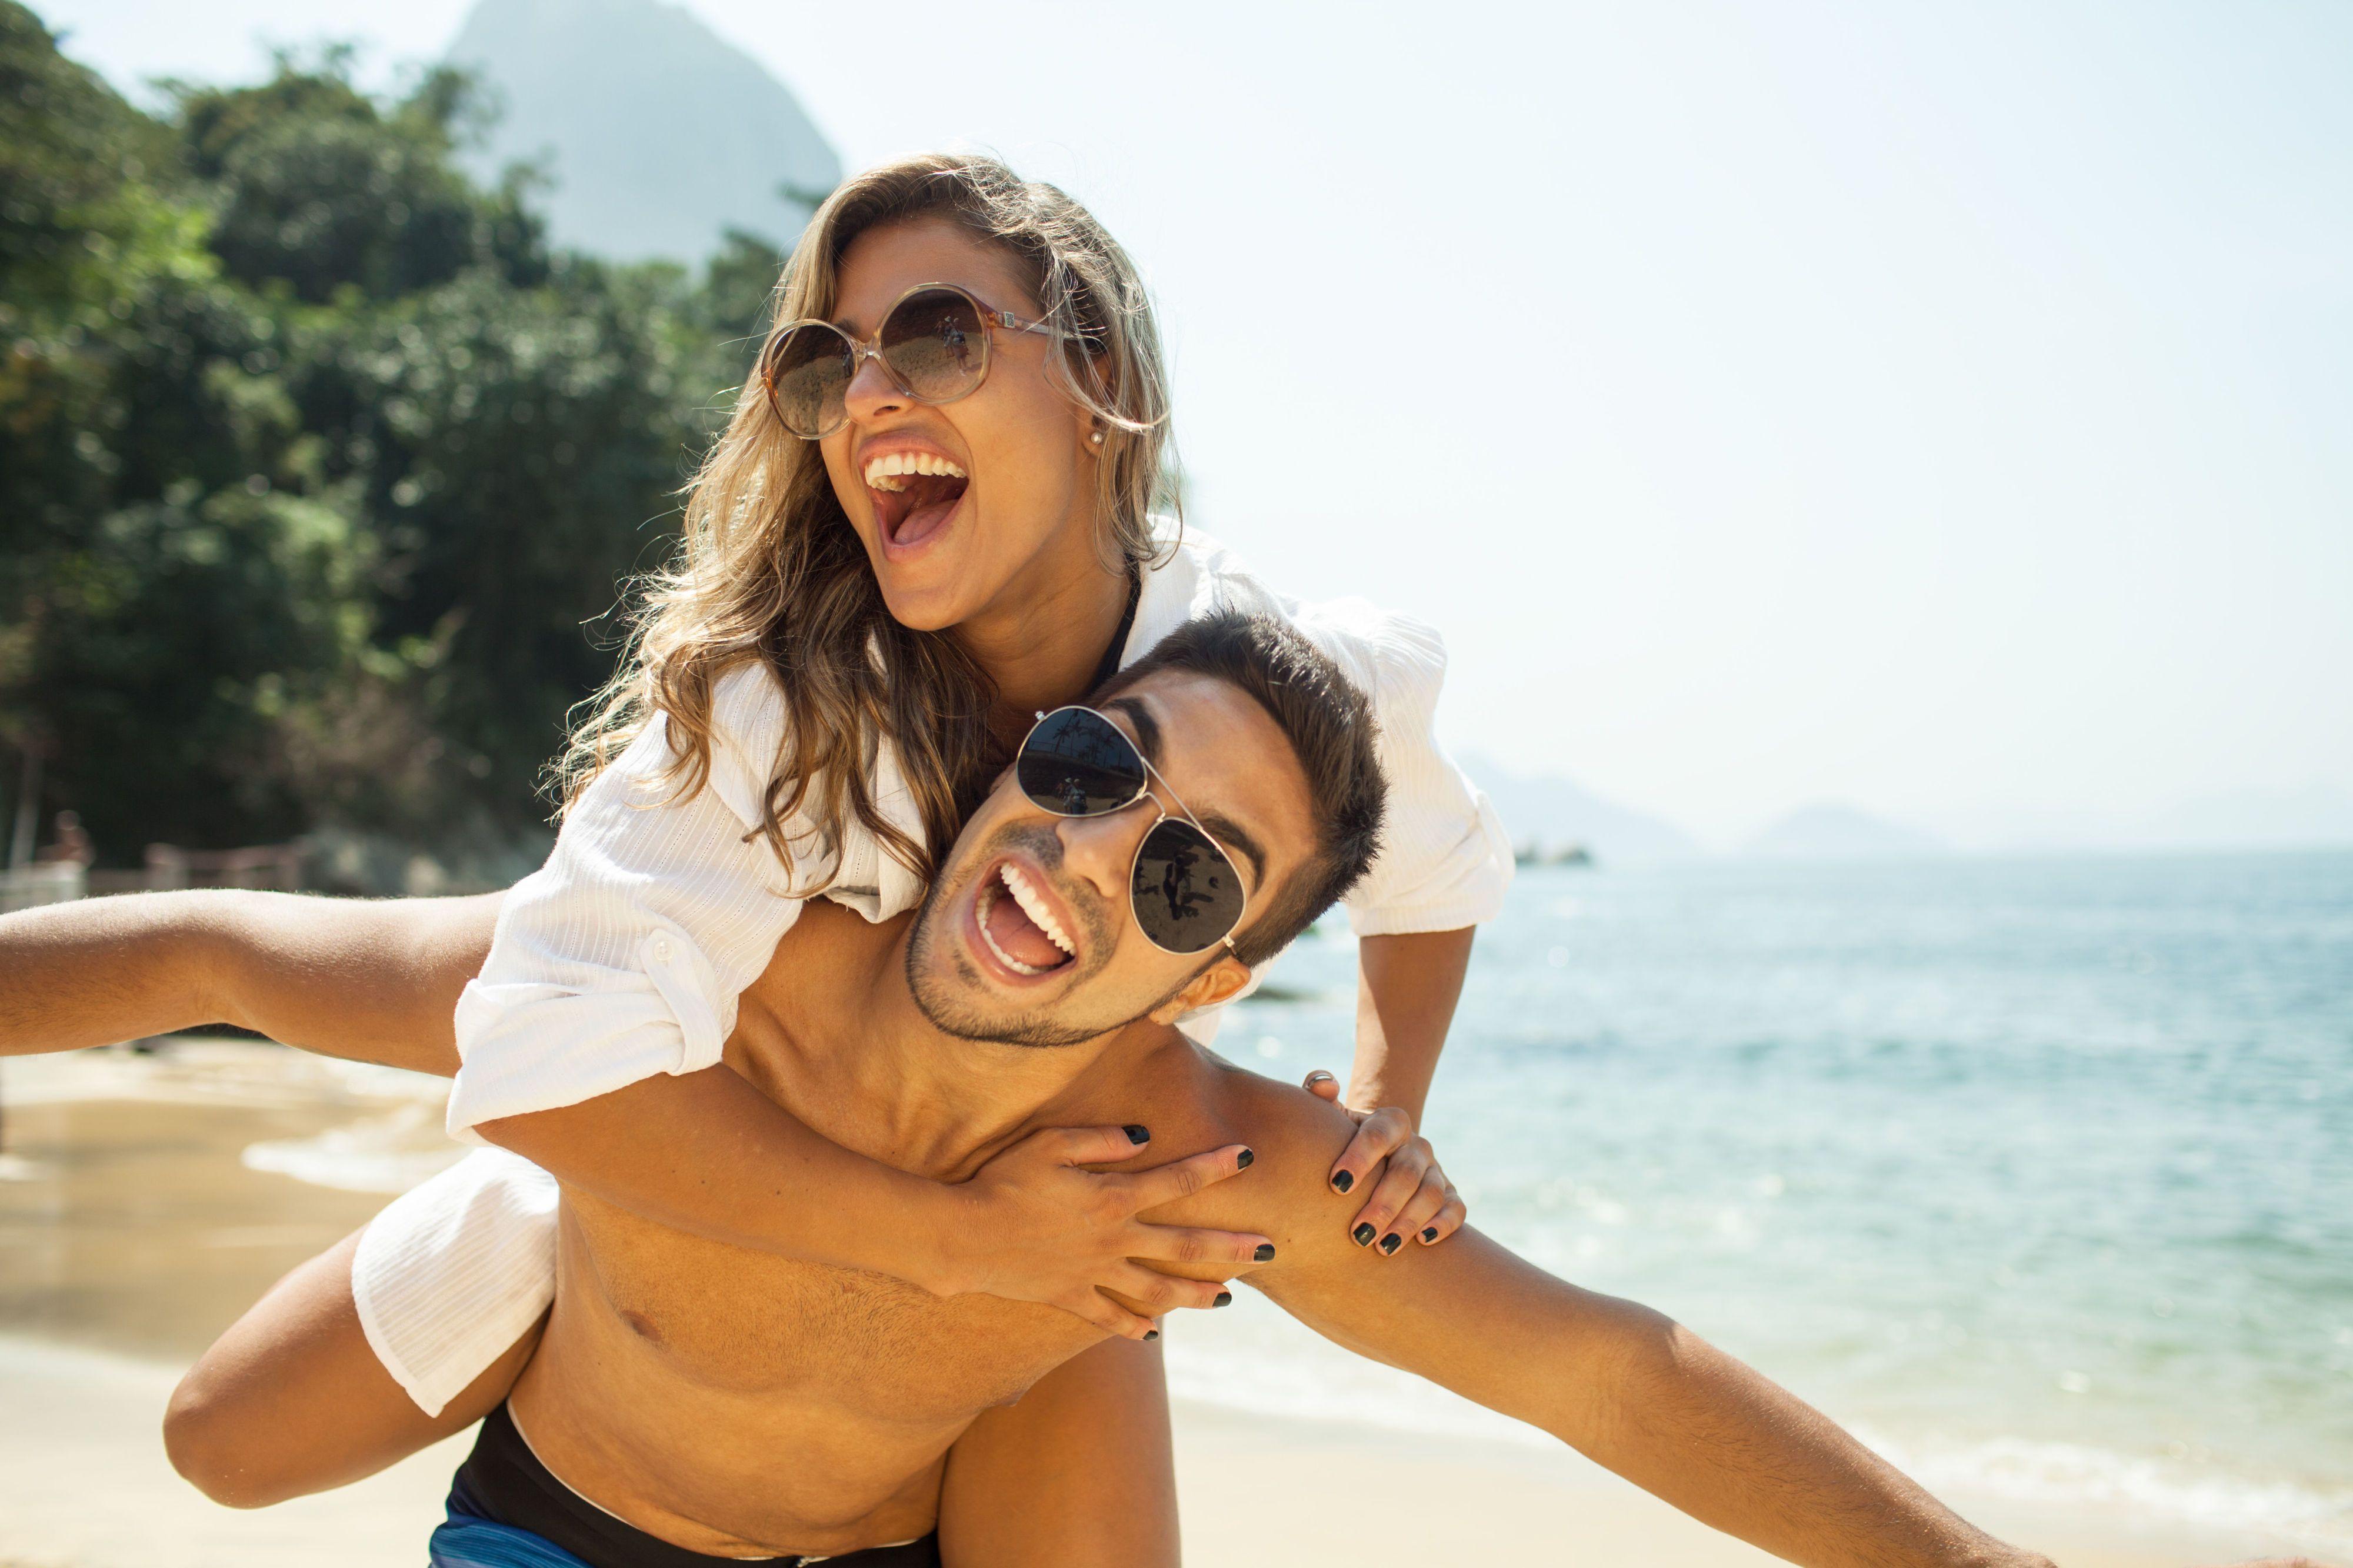 incontri online in Brasile imballatori fan Dating sito Web